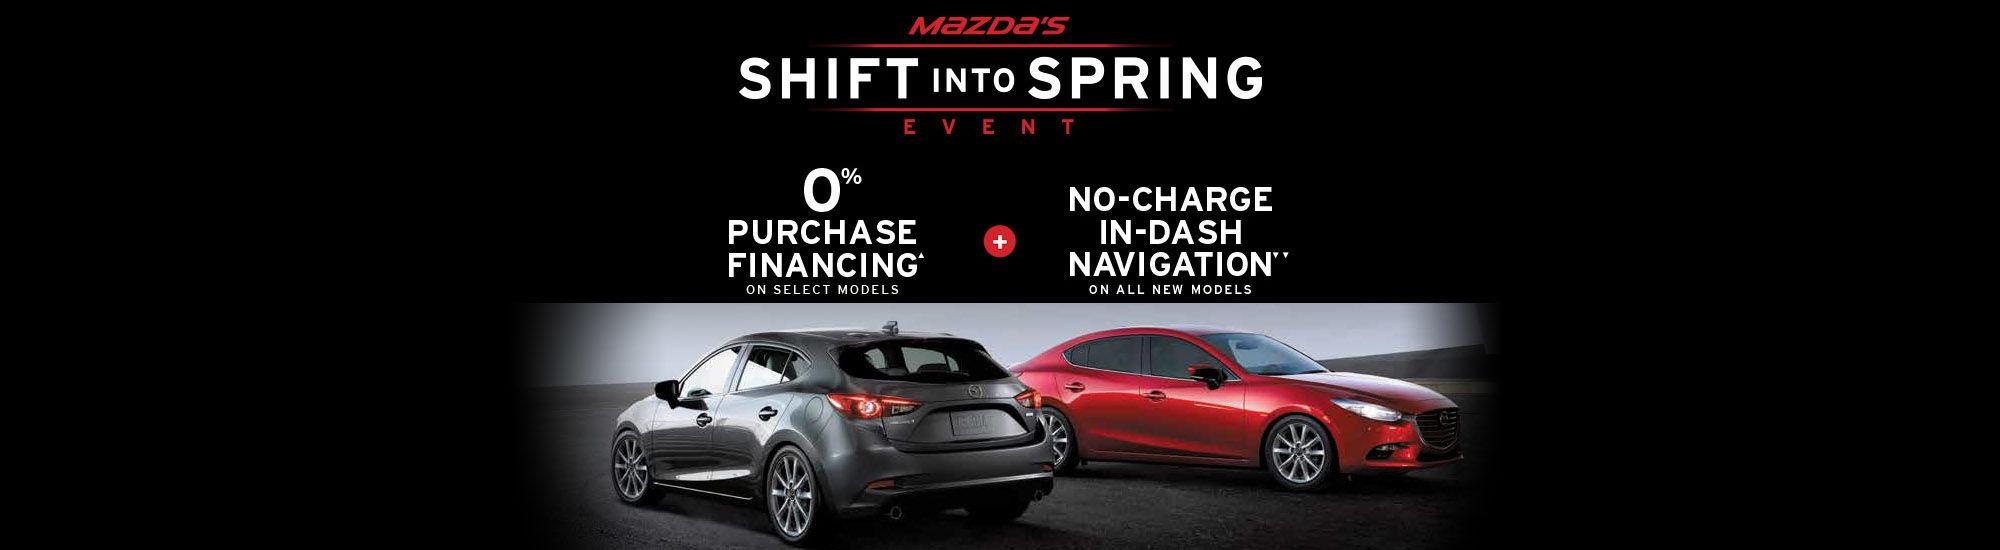 Mazda's Shift into spring event